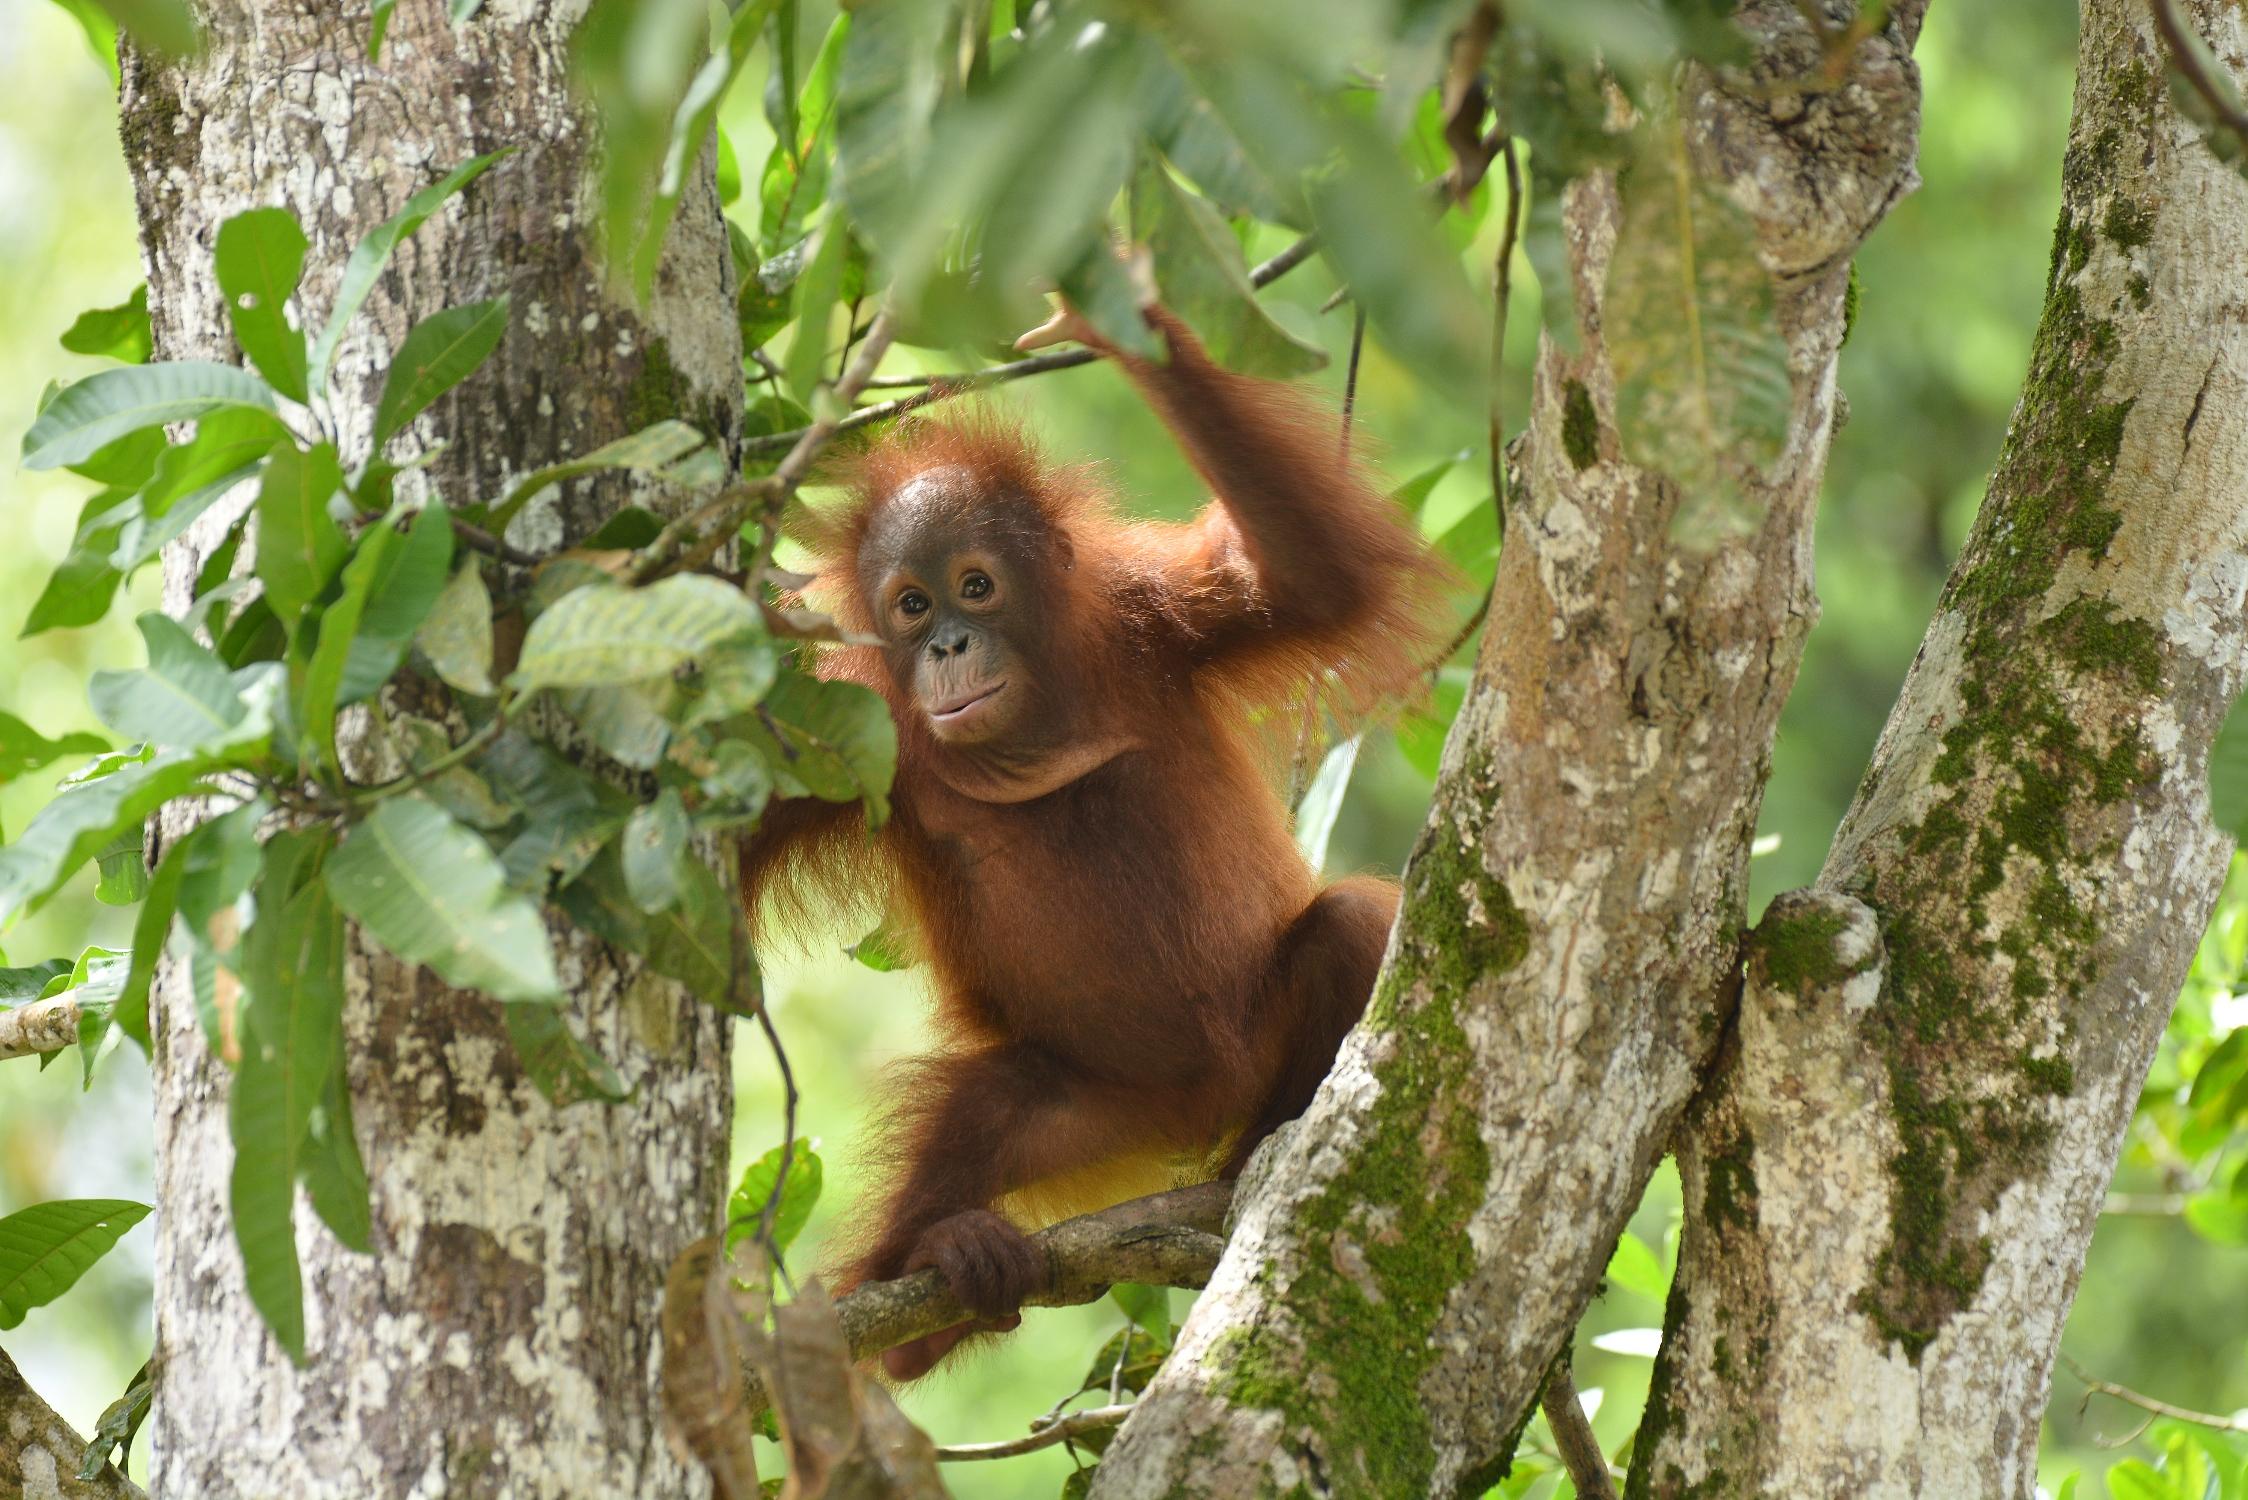 Kotim, 2015. Image© Orangutan Foundation.